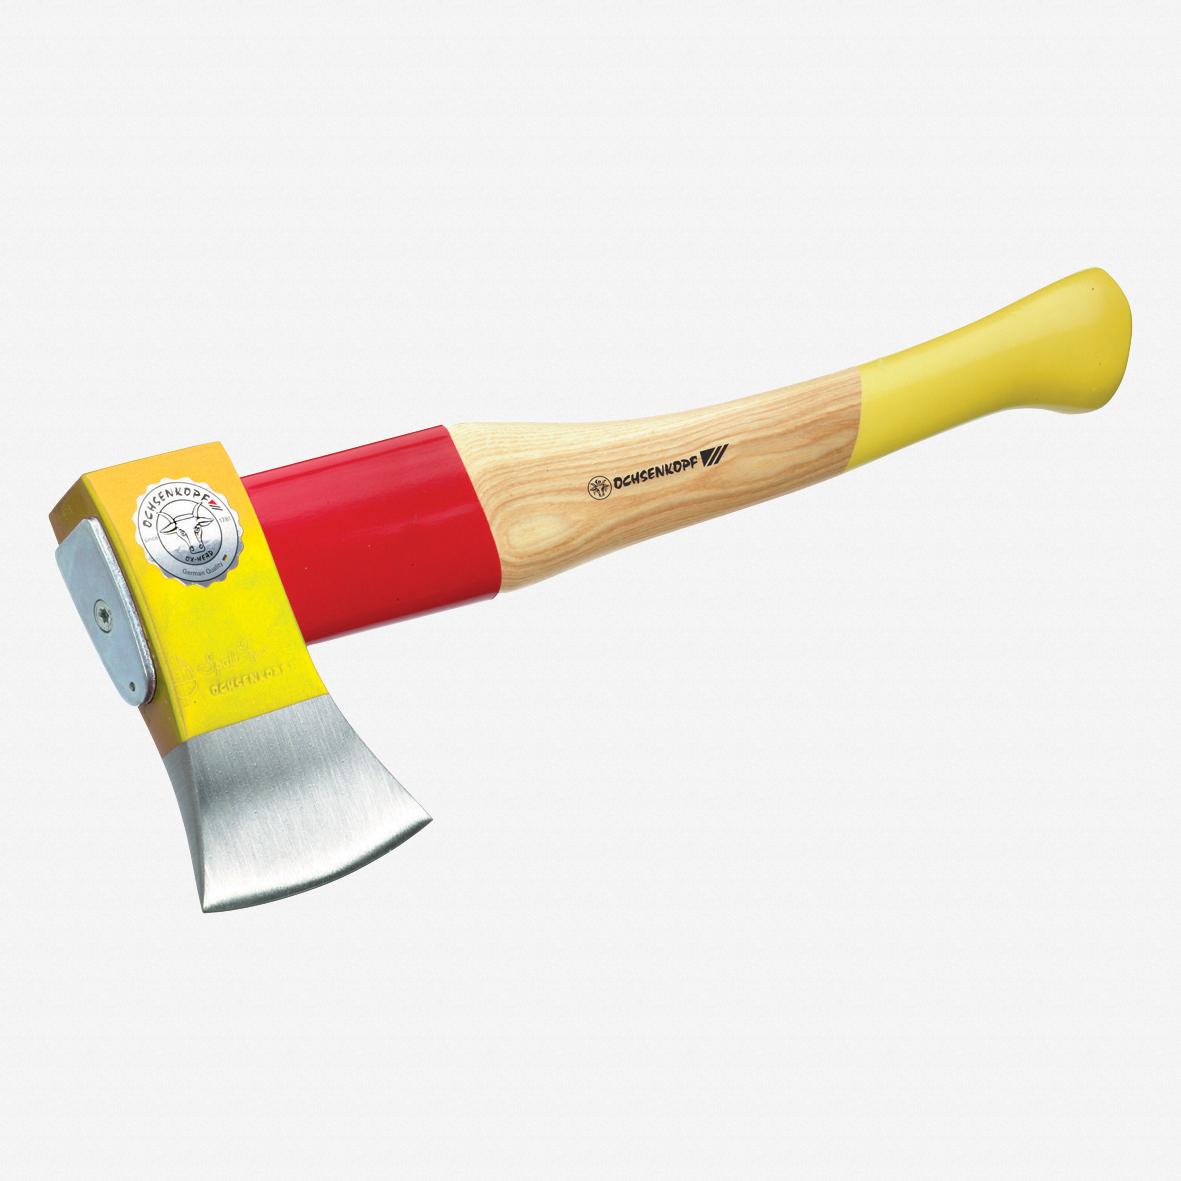 ochsenkopf ox 644 h-1255 hatchet split-quick rotband-plus